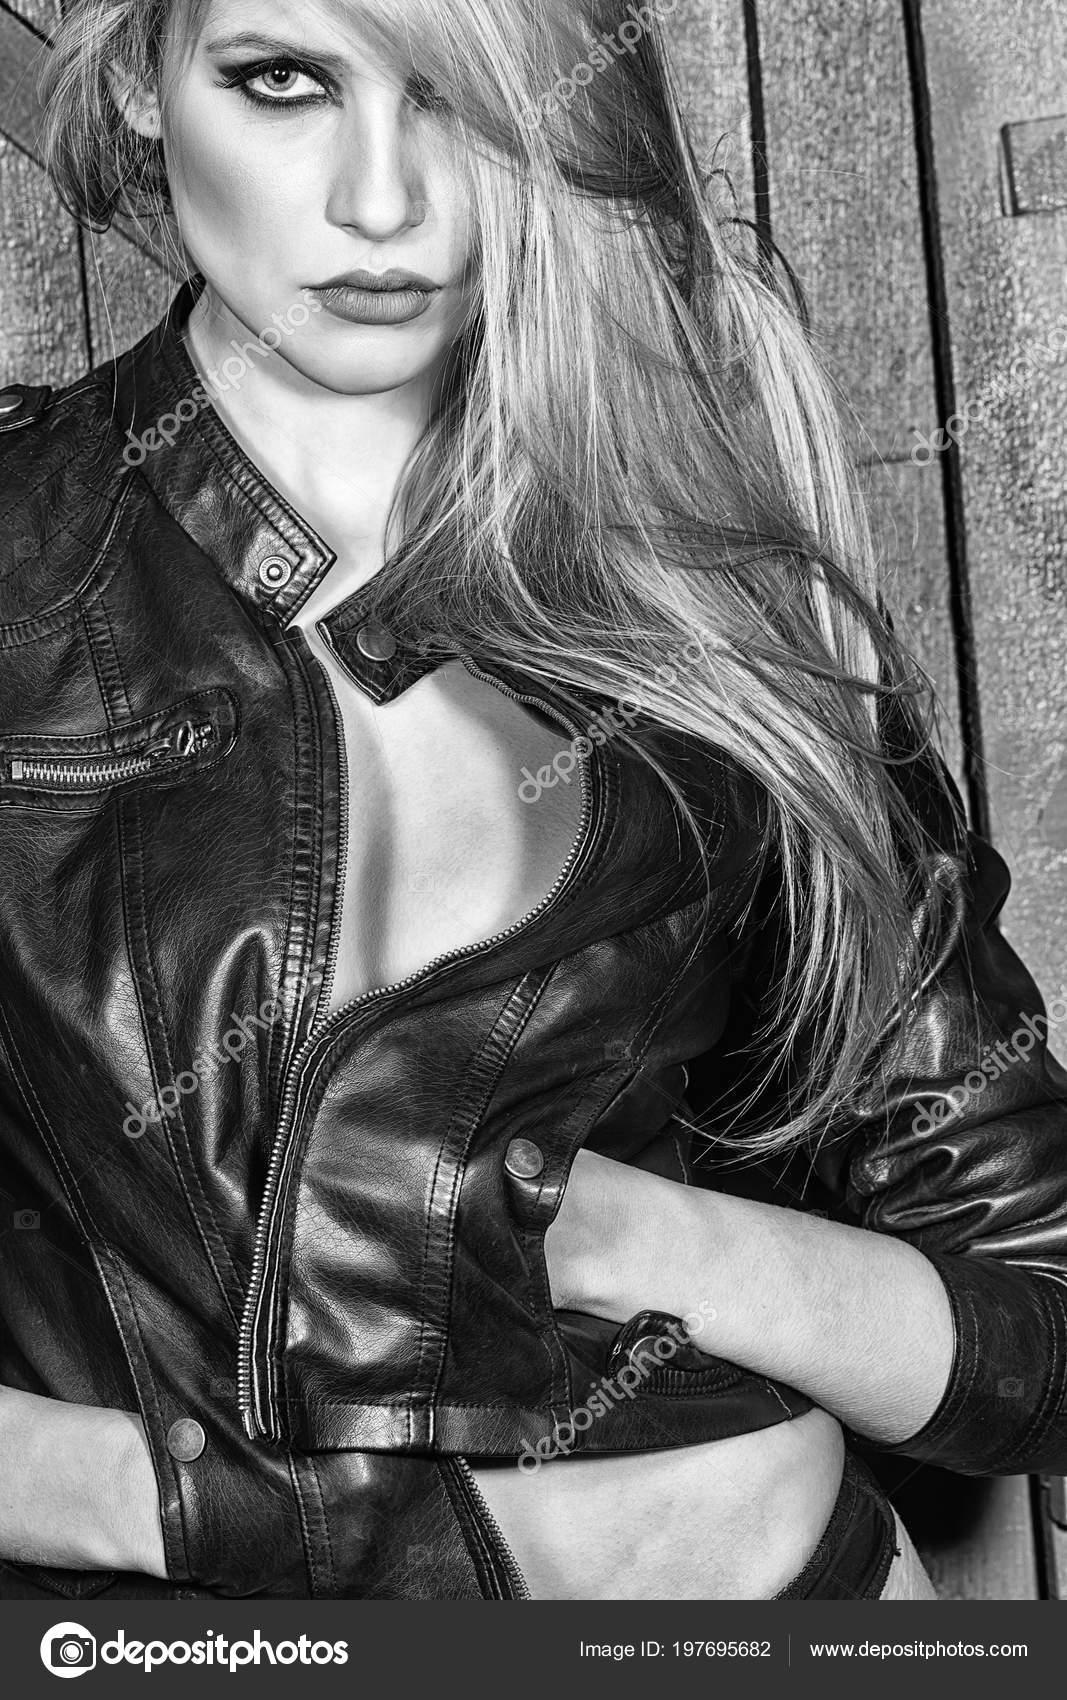 Fashion Model Woman Fece Close Up Face Woman Wiht Happy Emotion Passionate Sensual Woman